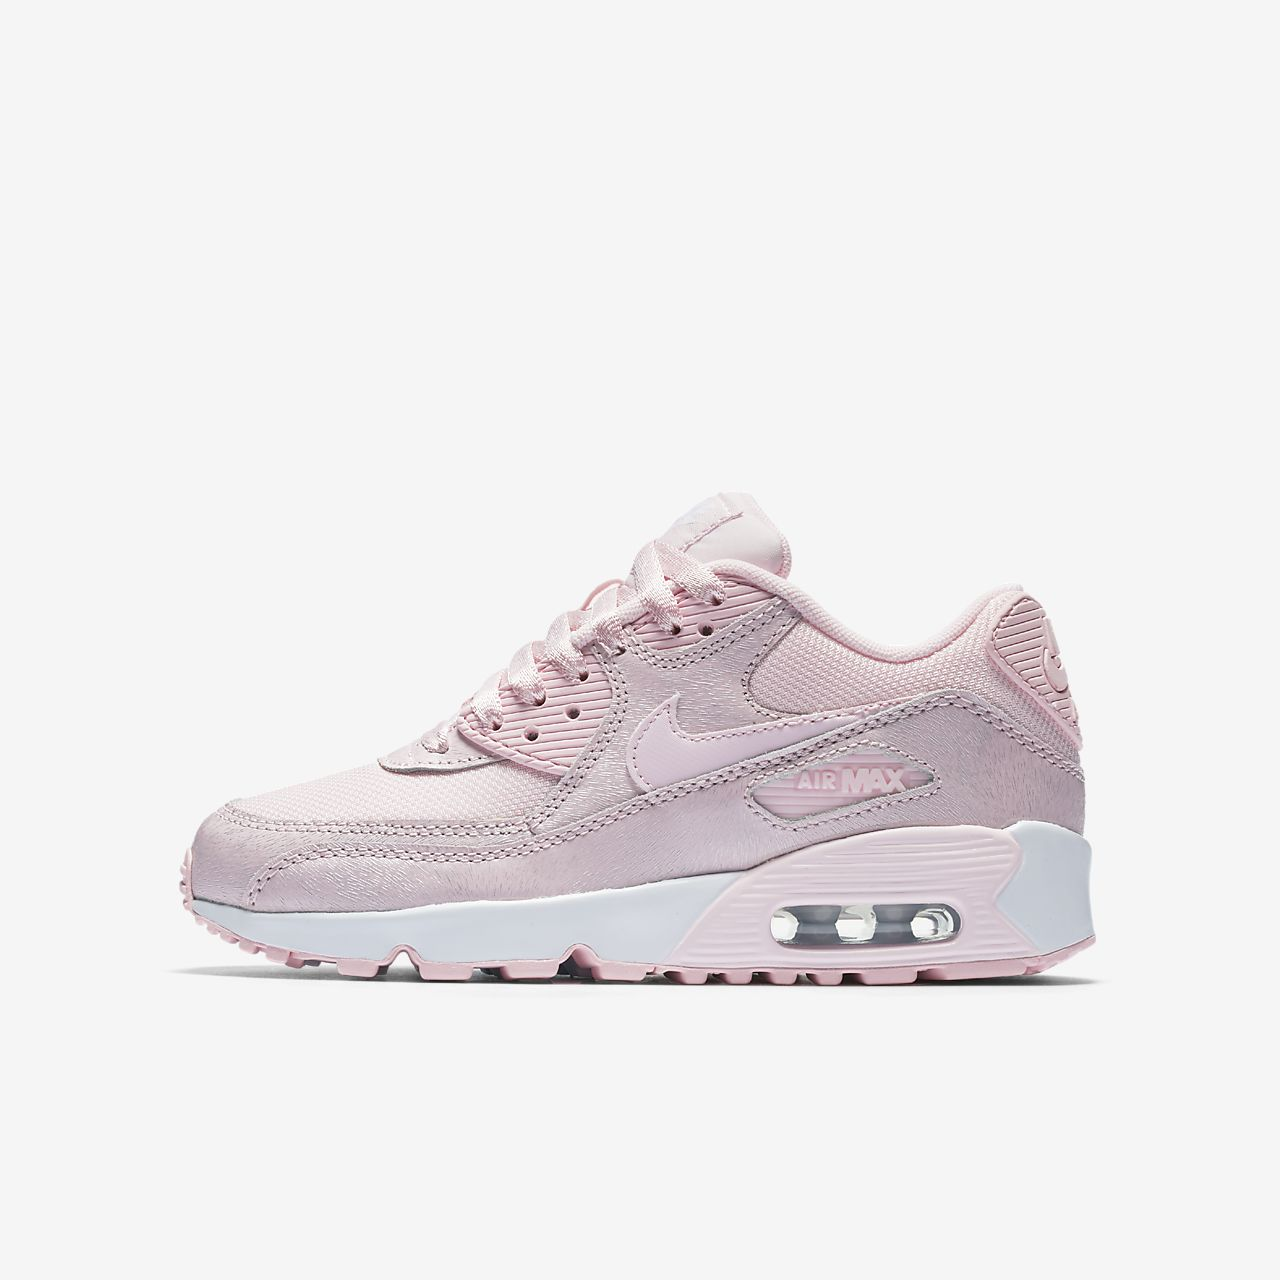 online store ce61d f36fd ... norway nike air max 90 se mesh big kids shoe 12247 9e732 ...